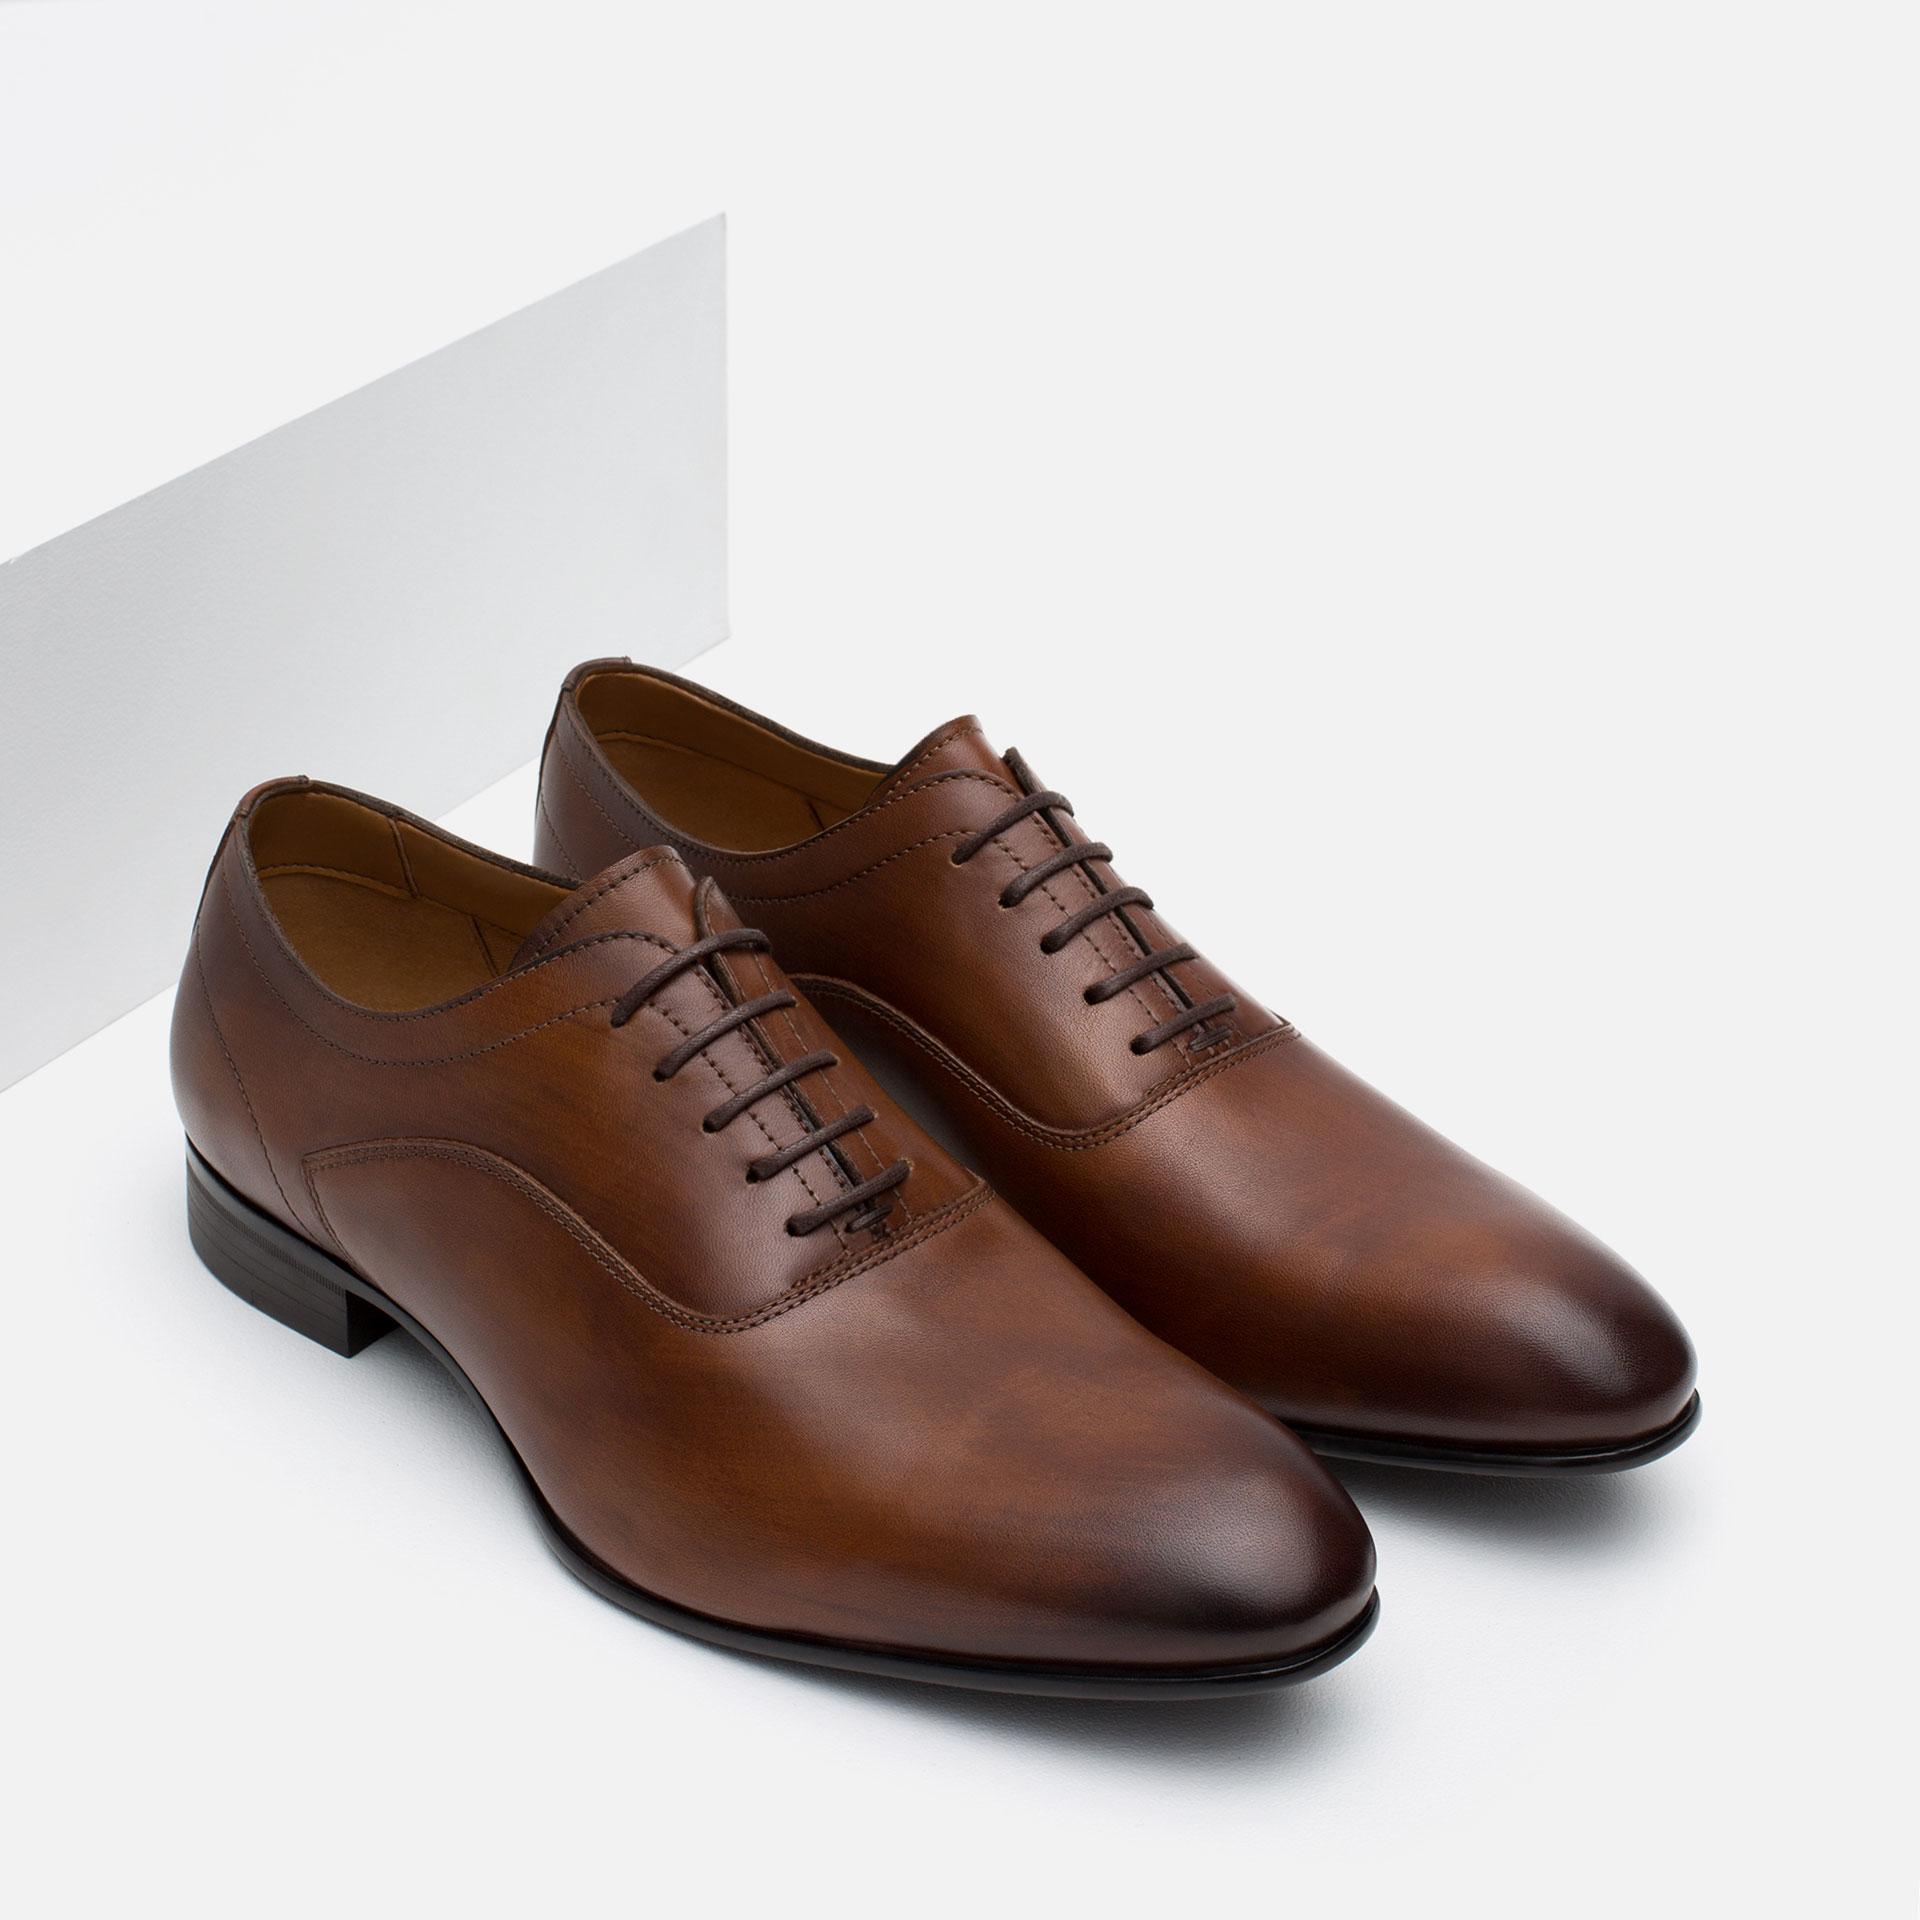 Aquatalia Shoes Uk